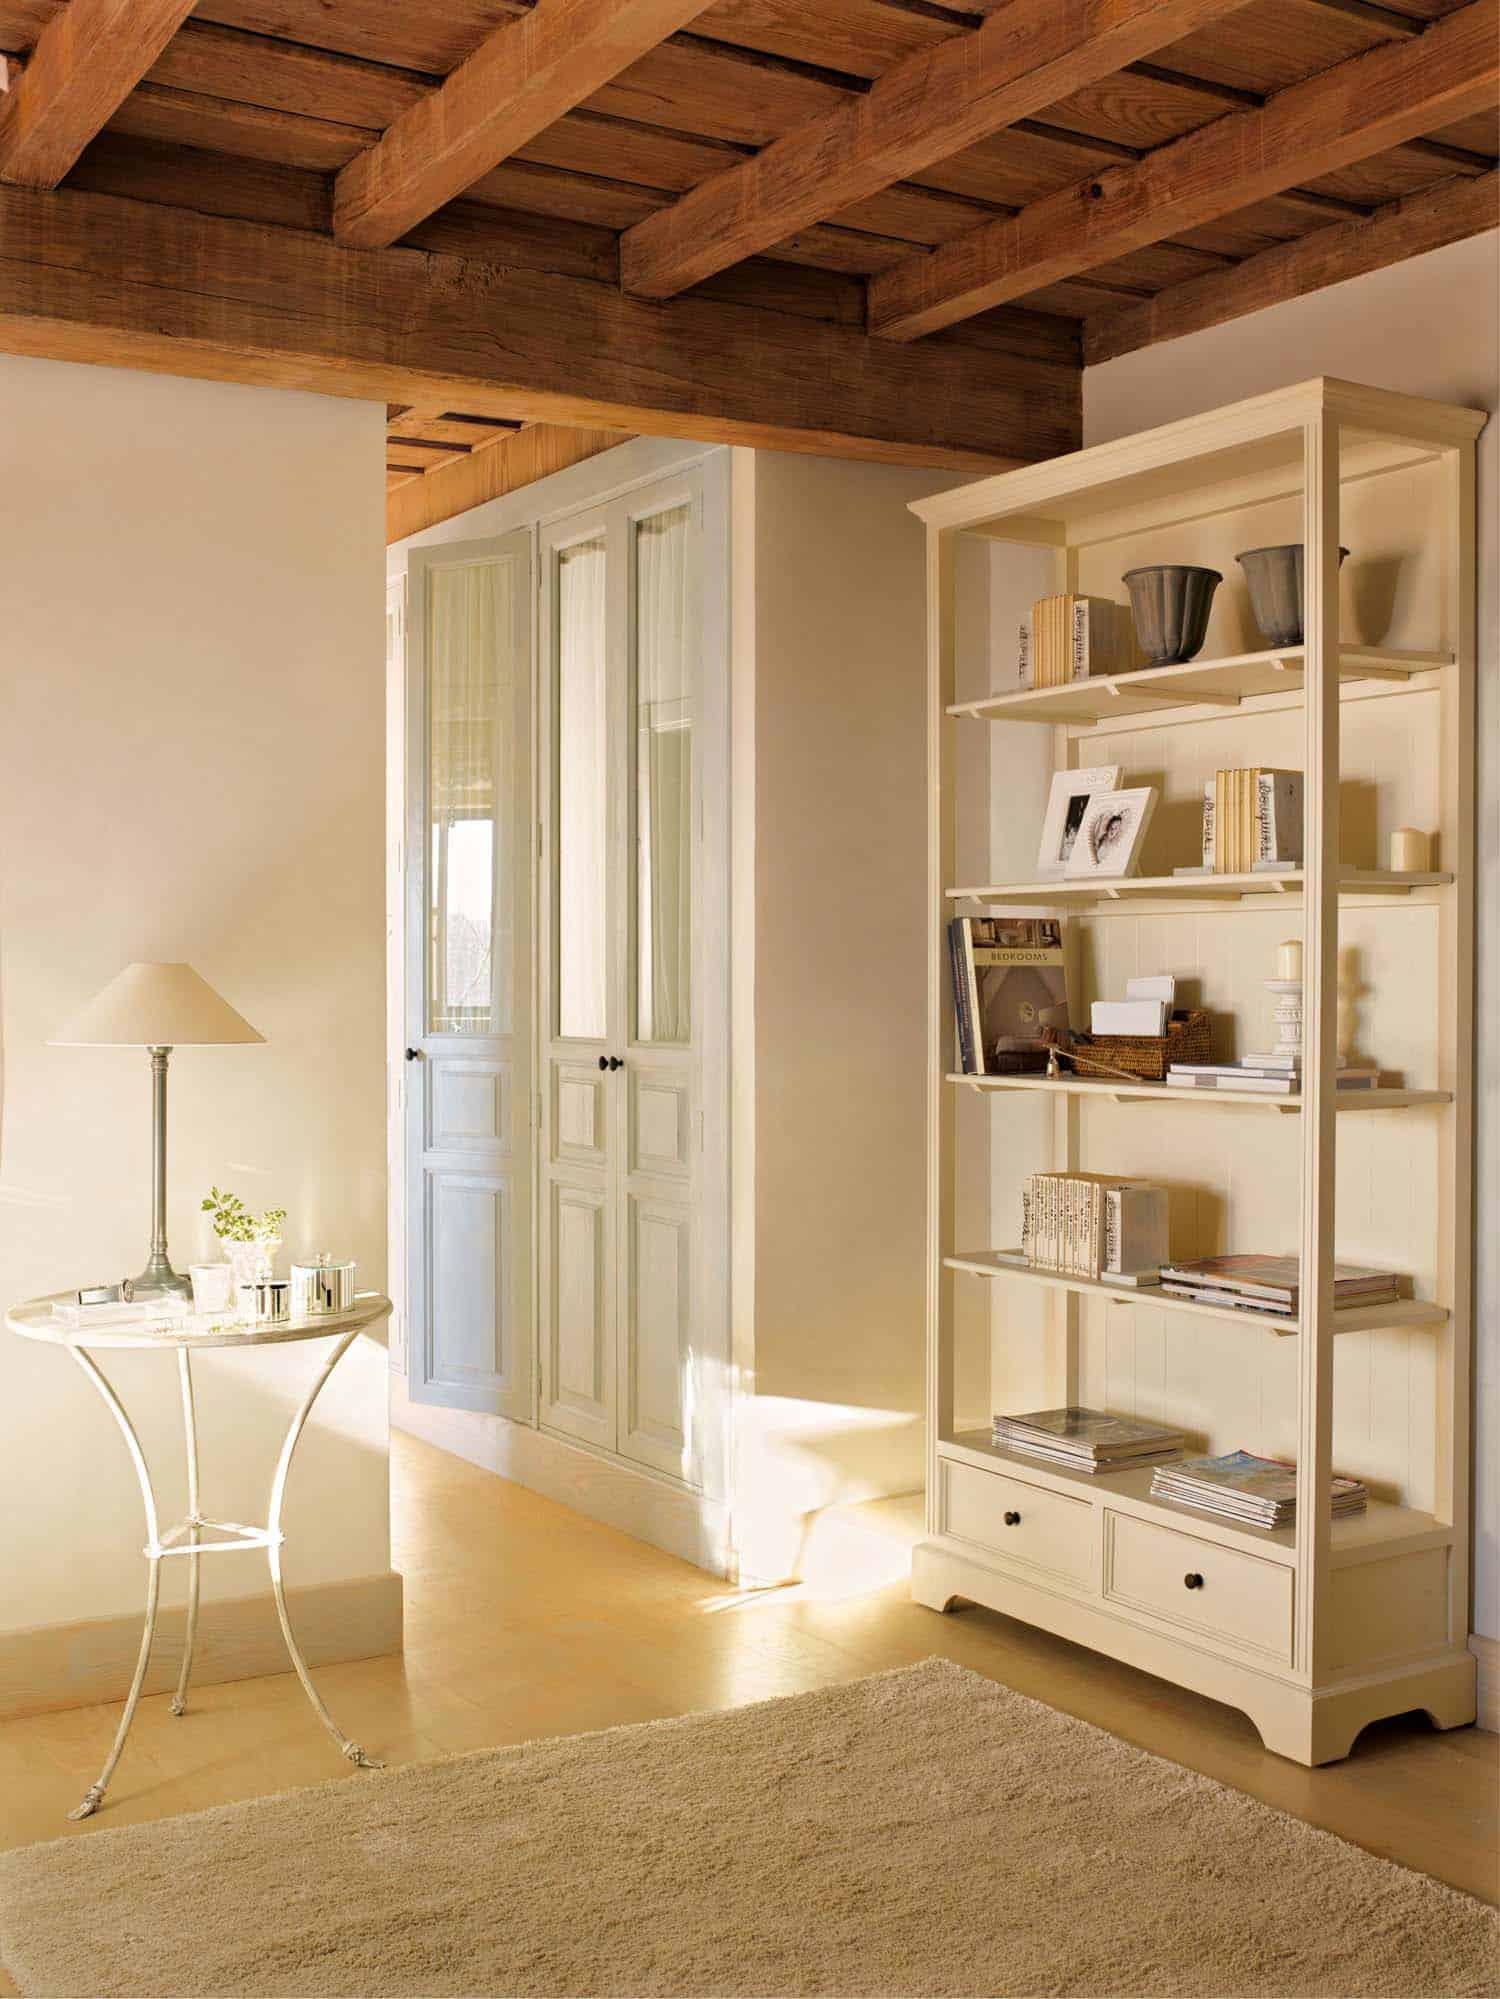 Rénové Rustic Modern Home-16-1 Kindesign